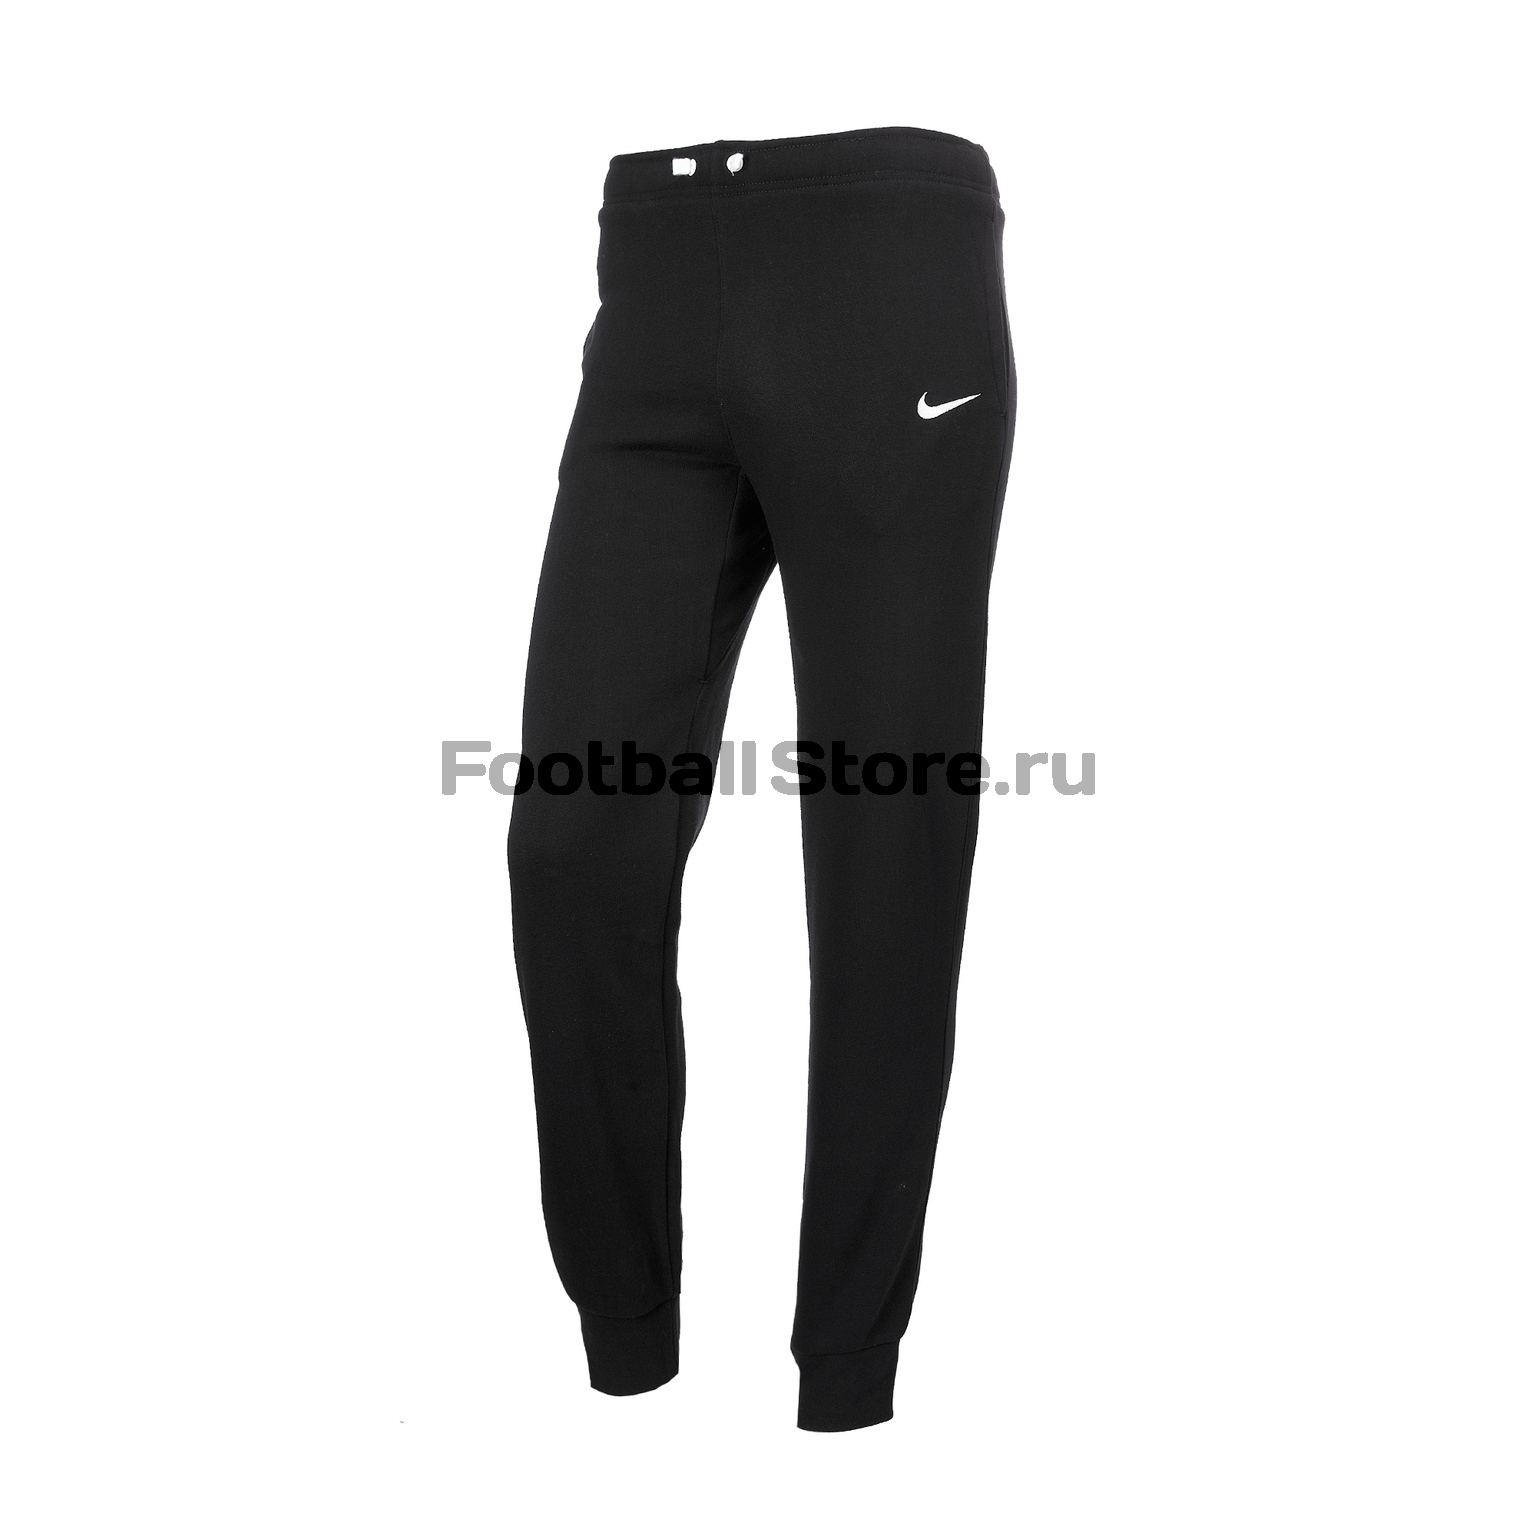 Брюки подростковые Nike Pant Club19 AJ1549-010 цена в Москве и Питере